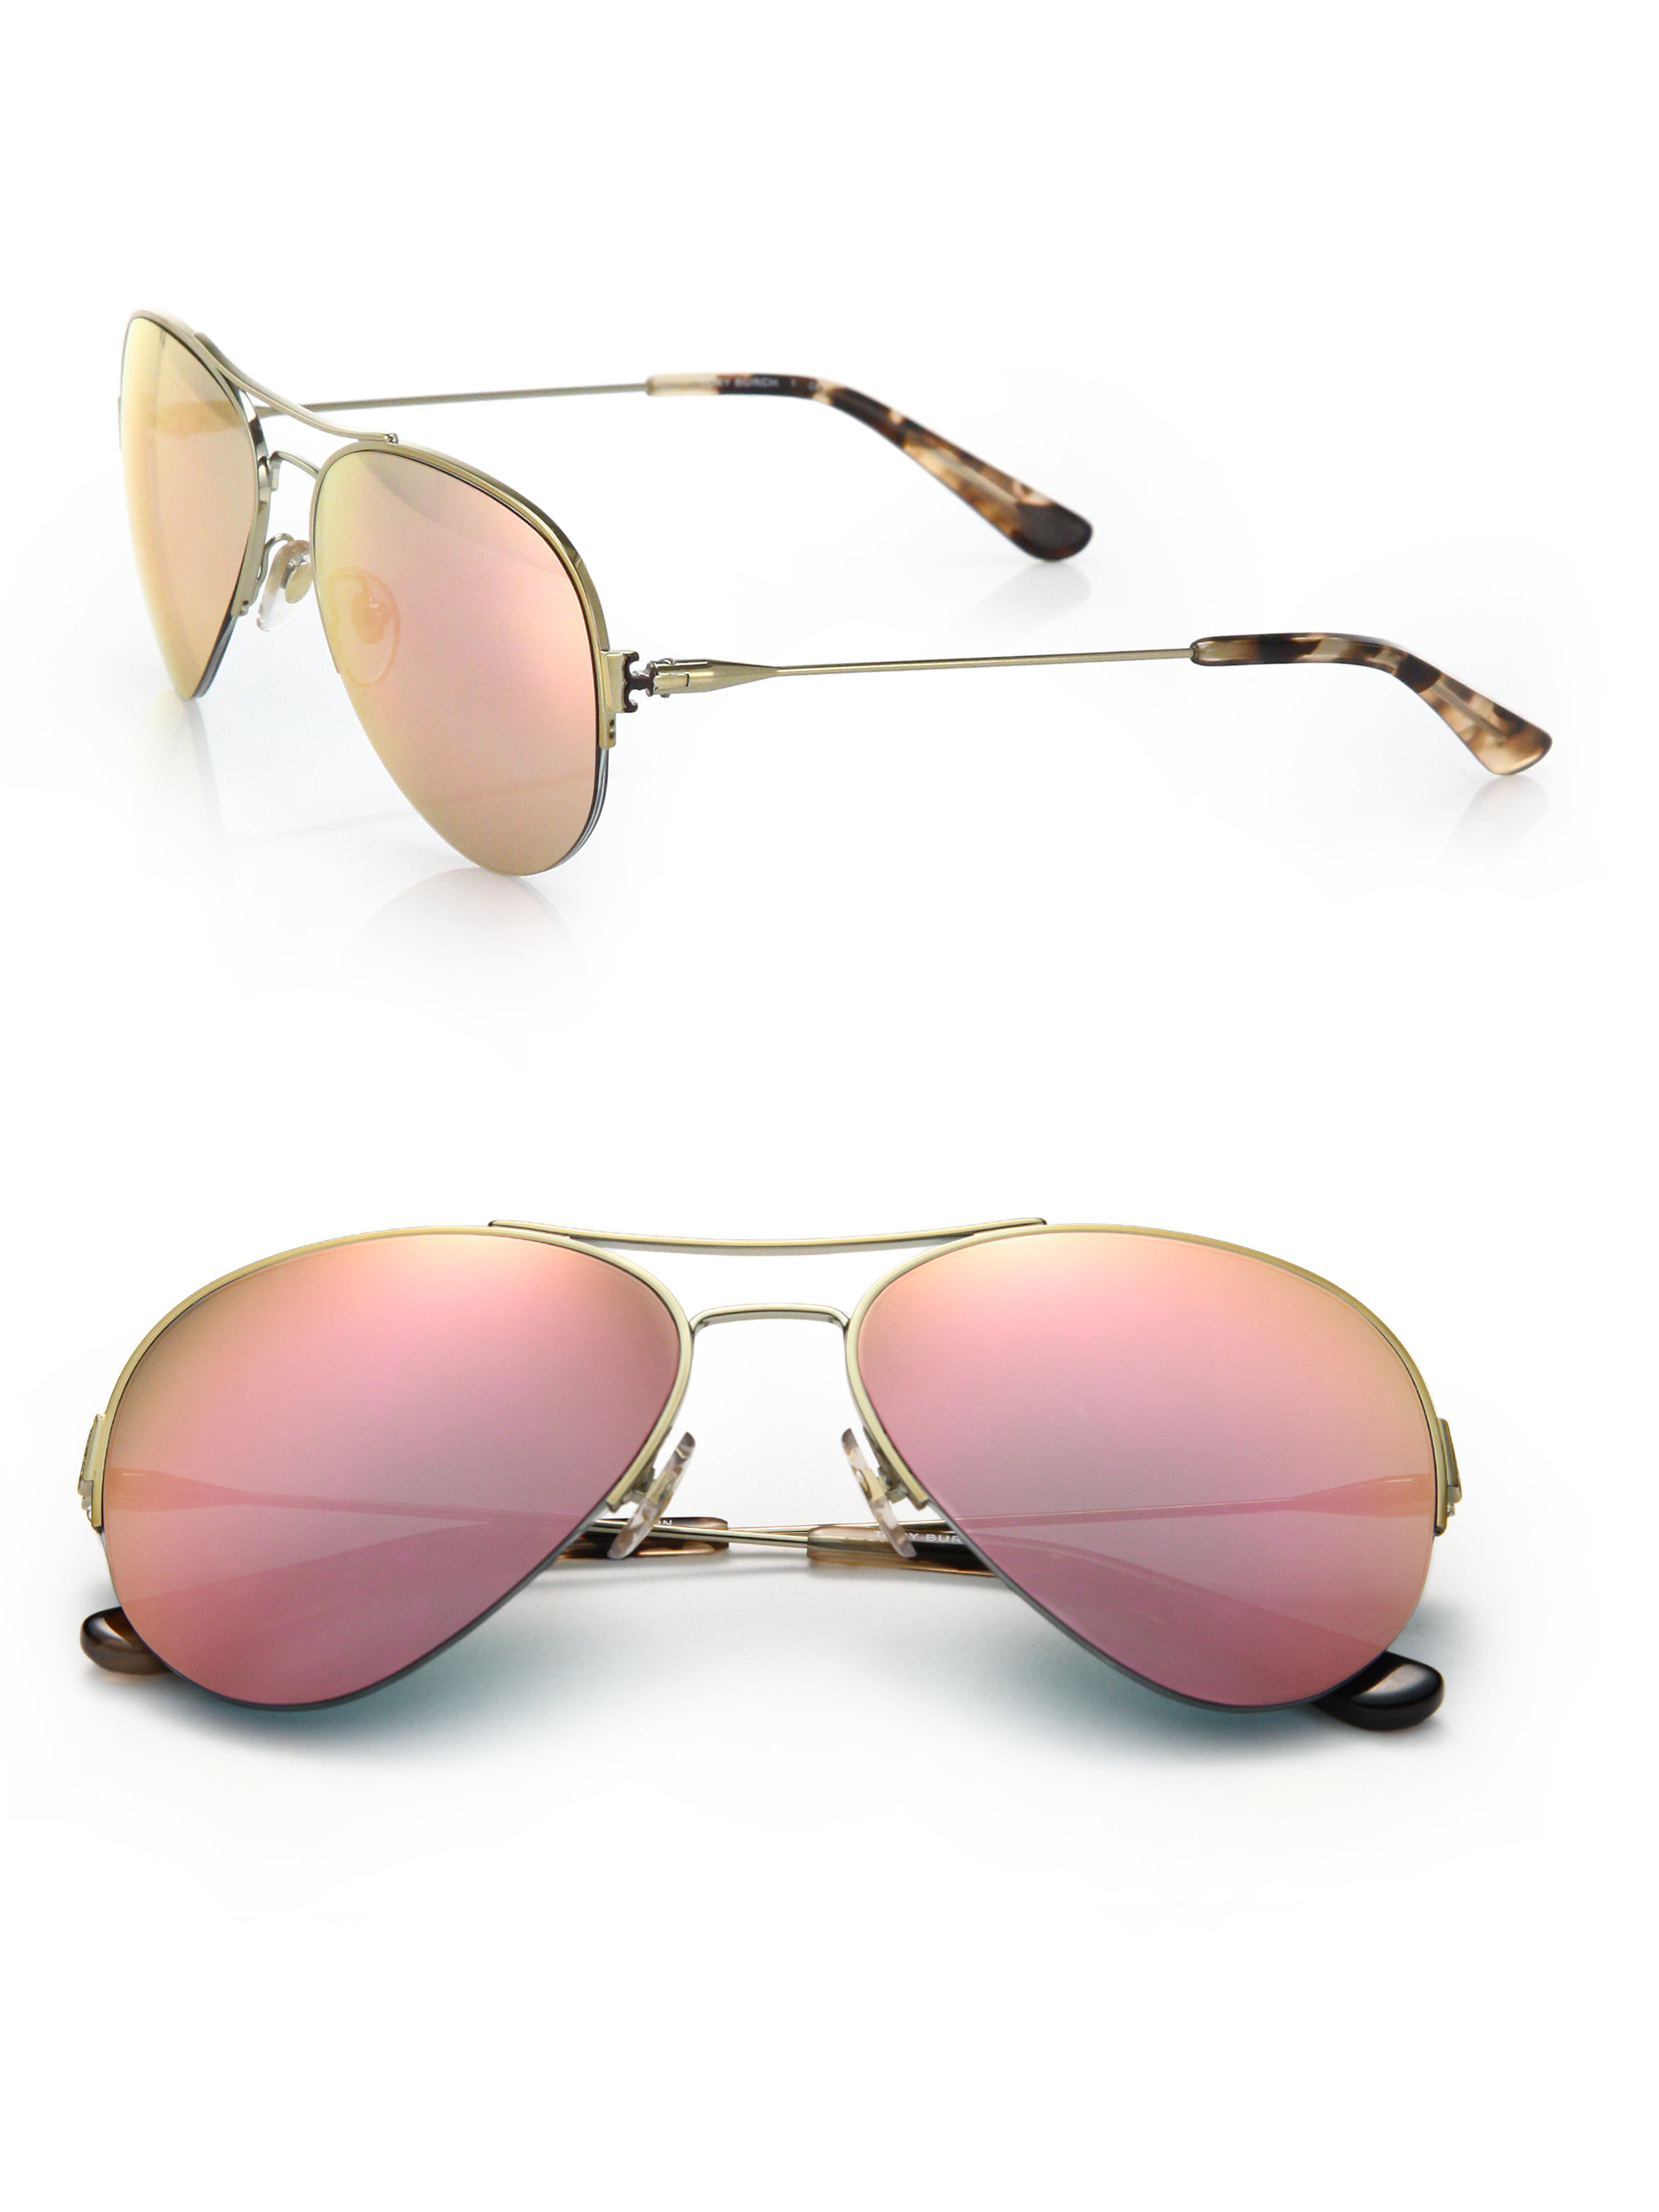 b7d4ad4c292 Lyst - Tory Burch Mirrored Lens Aviator Sunglasses in Metallic